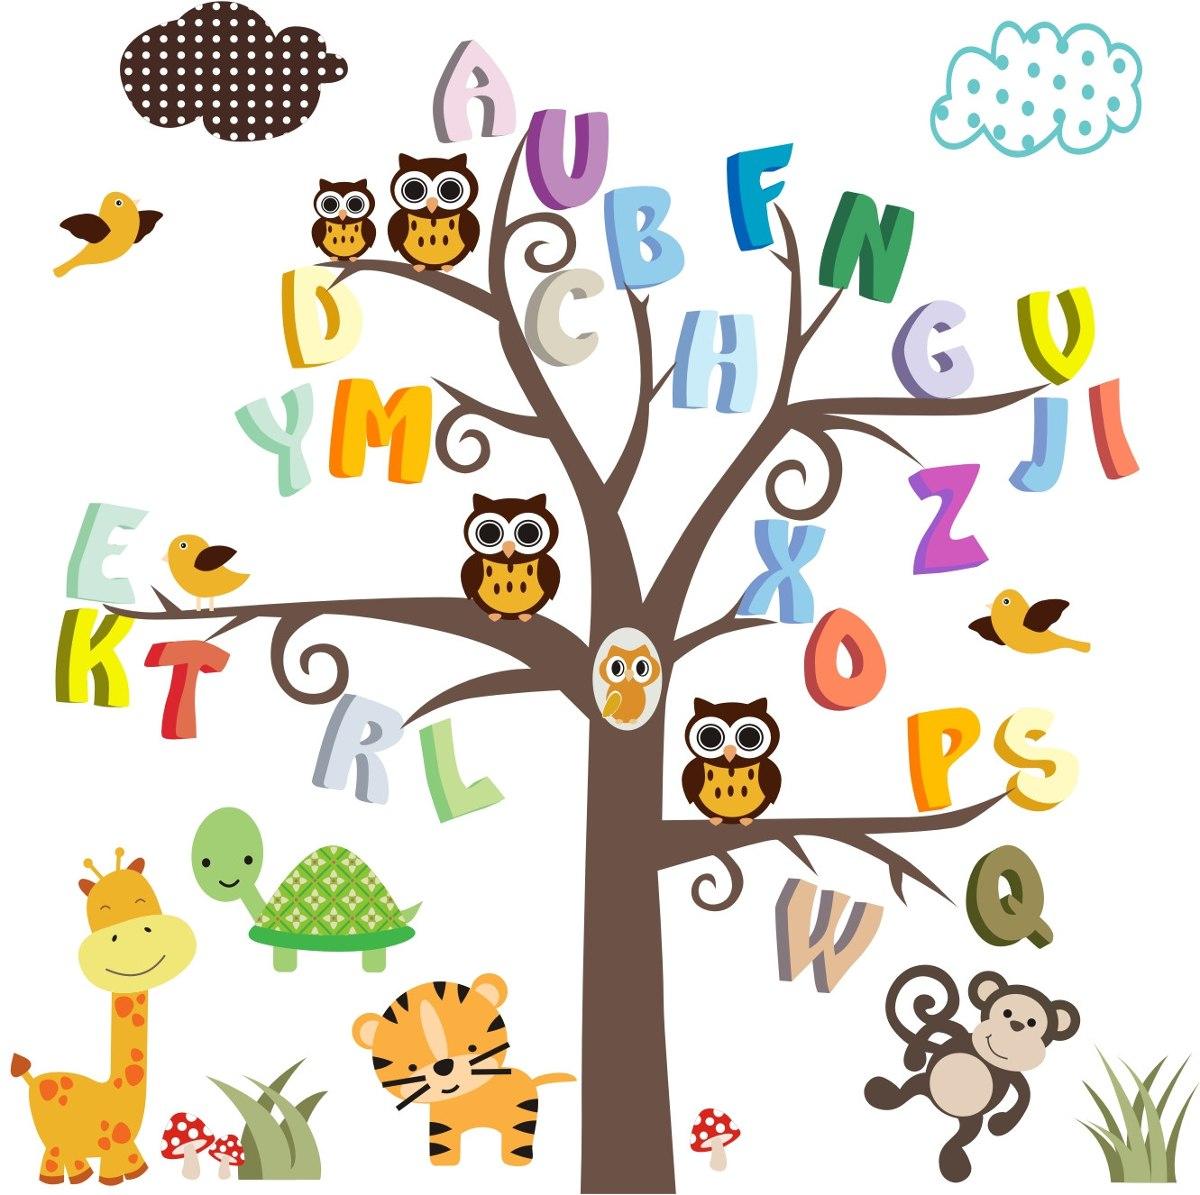 Adesivo papel parede infantil macaco safari animais zoo - Papel decorativo infantil para paredes ...